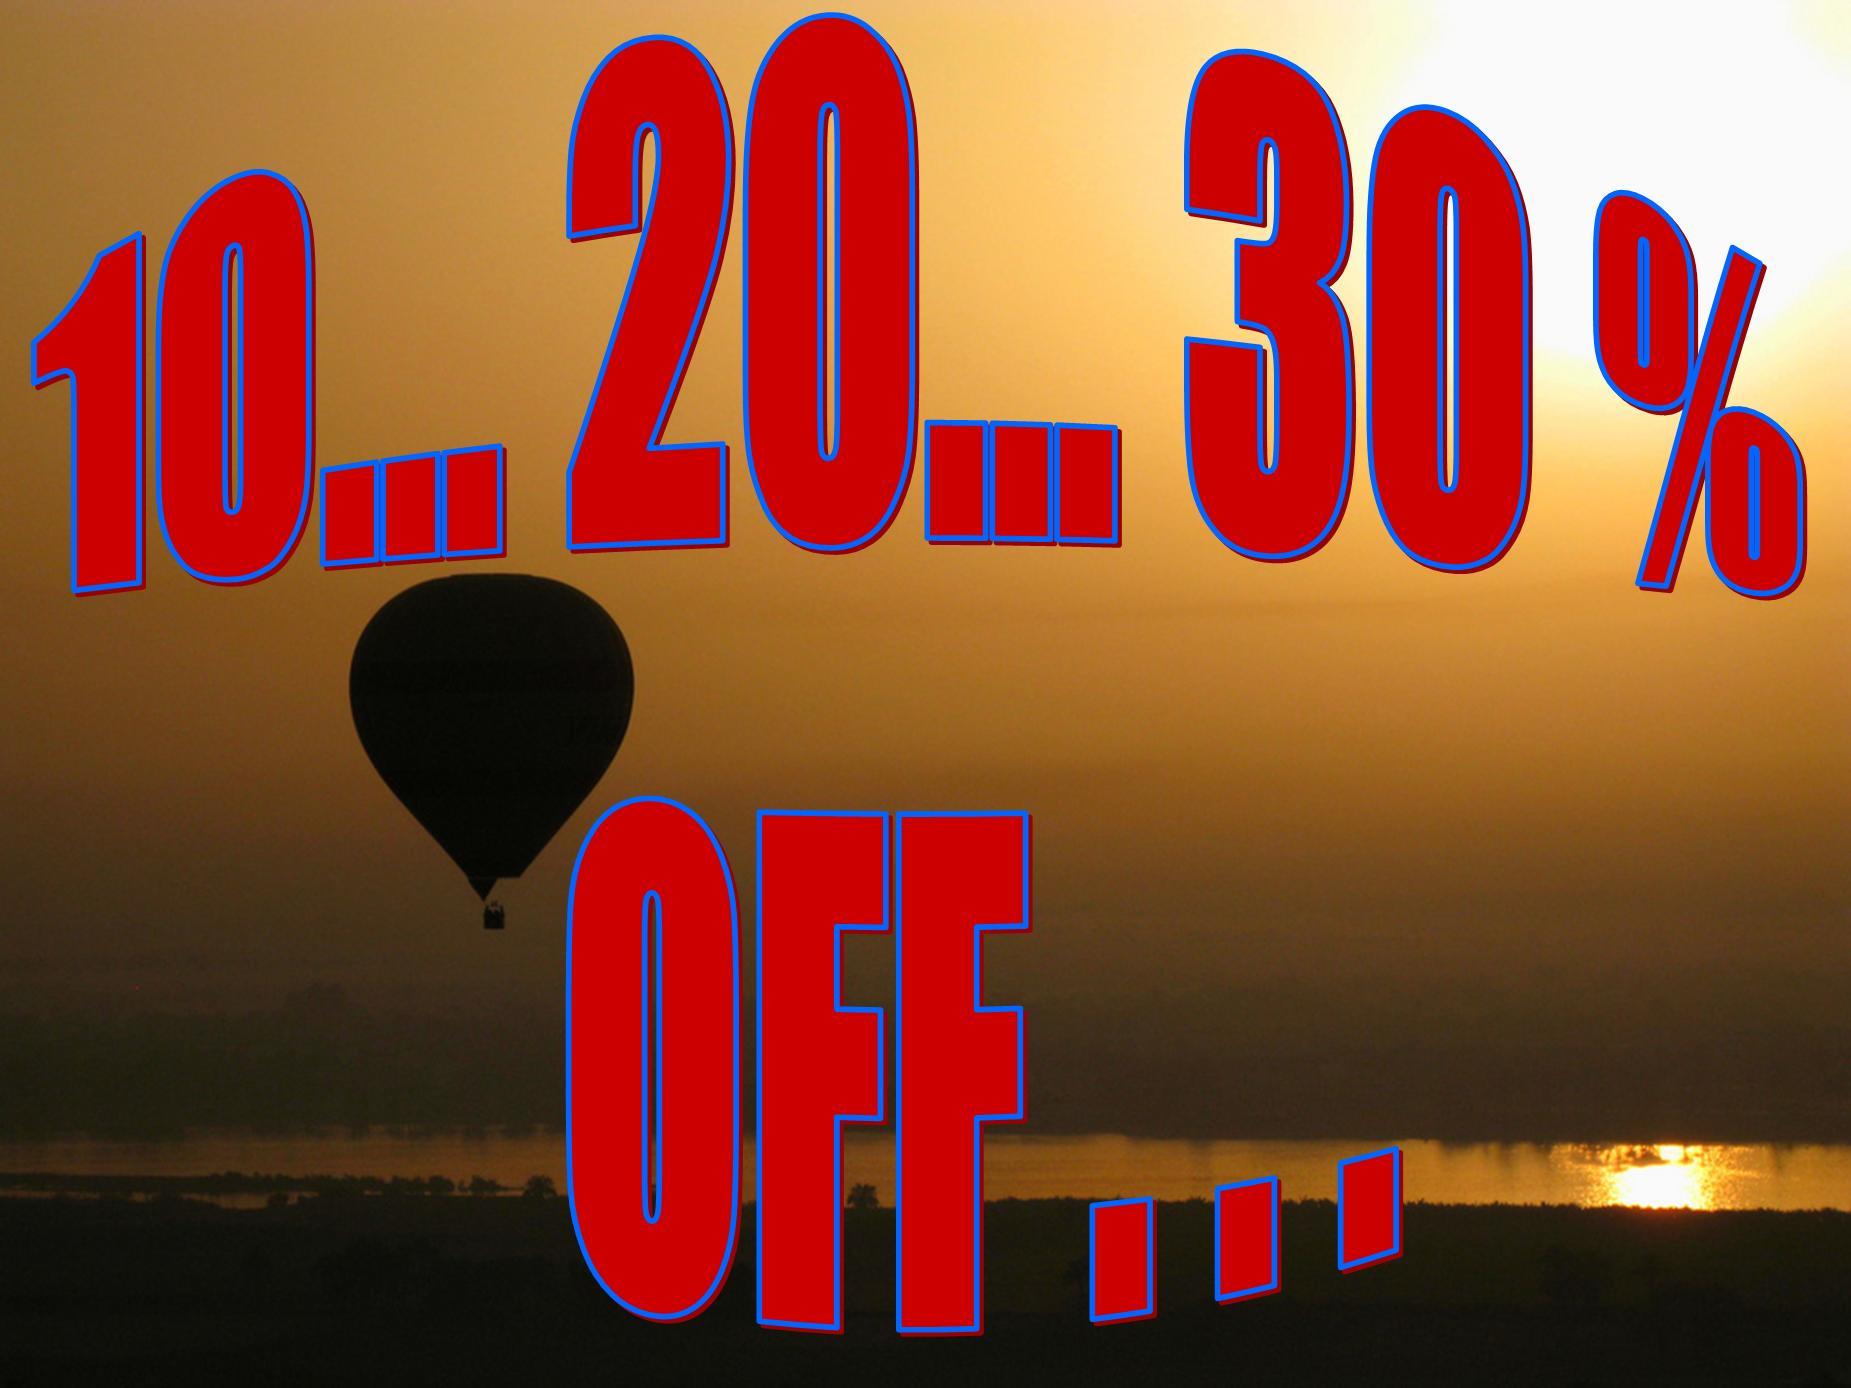 discount_balloon